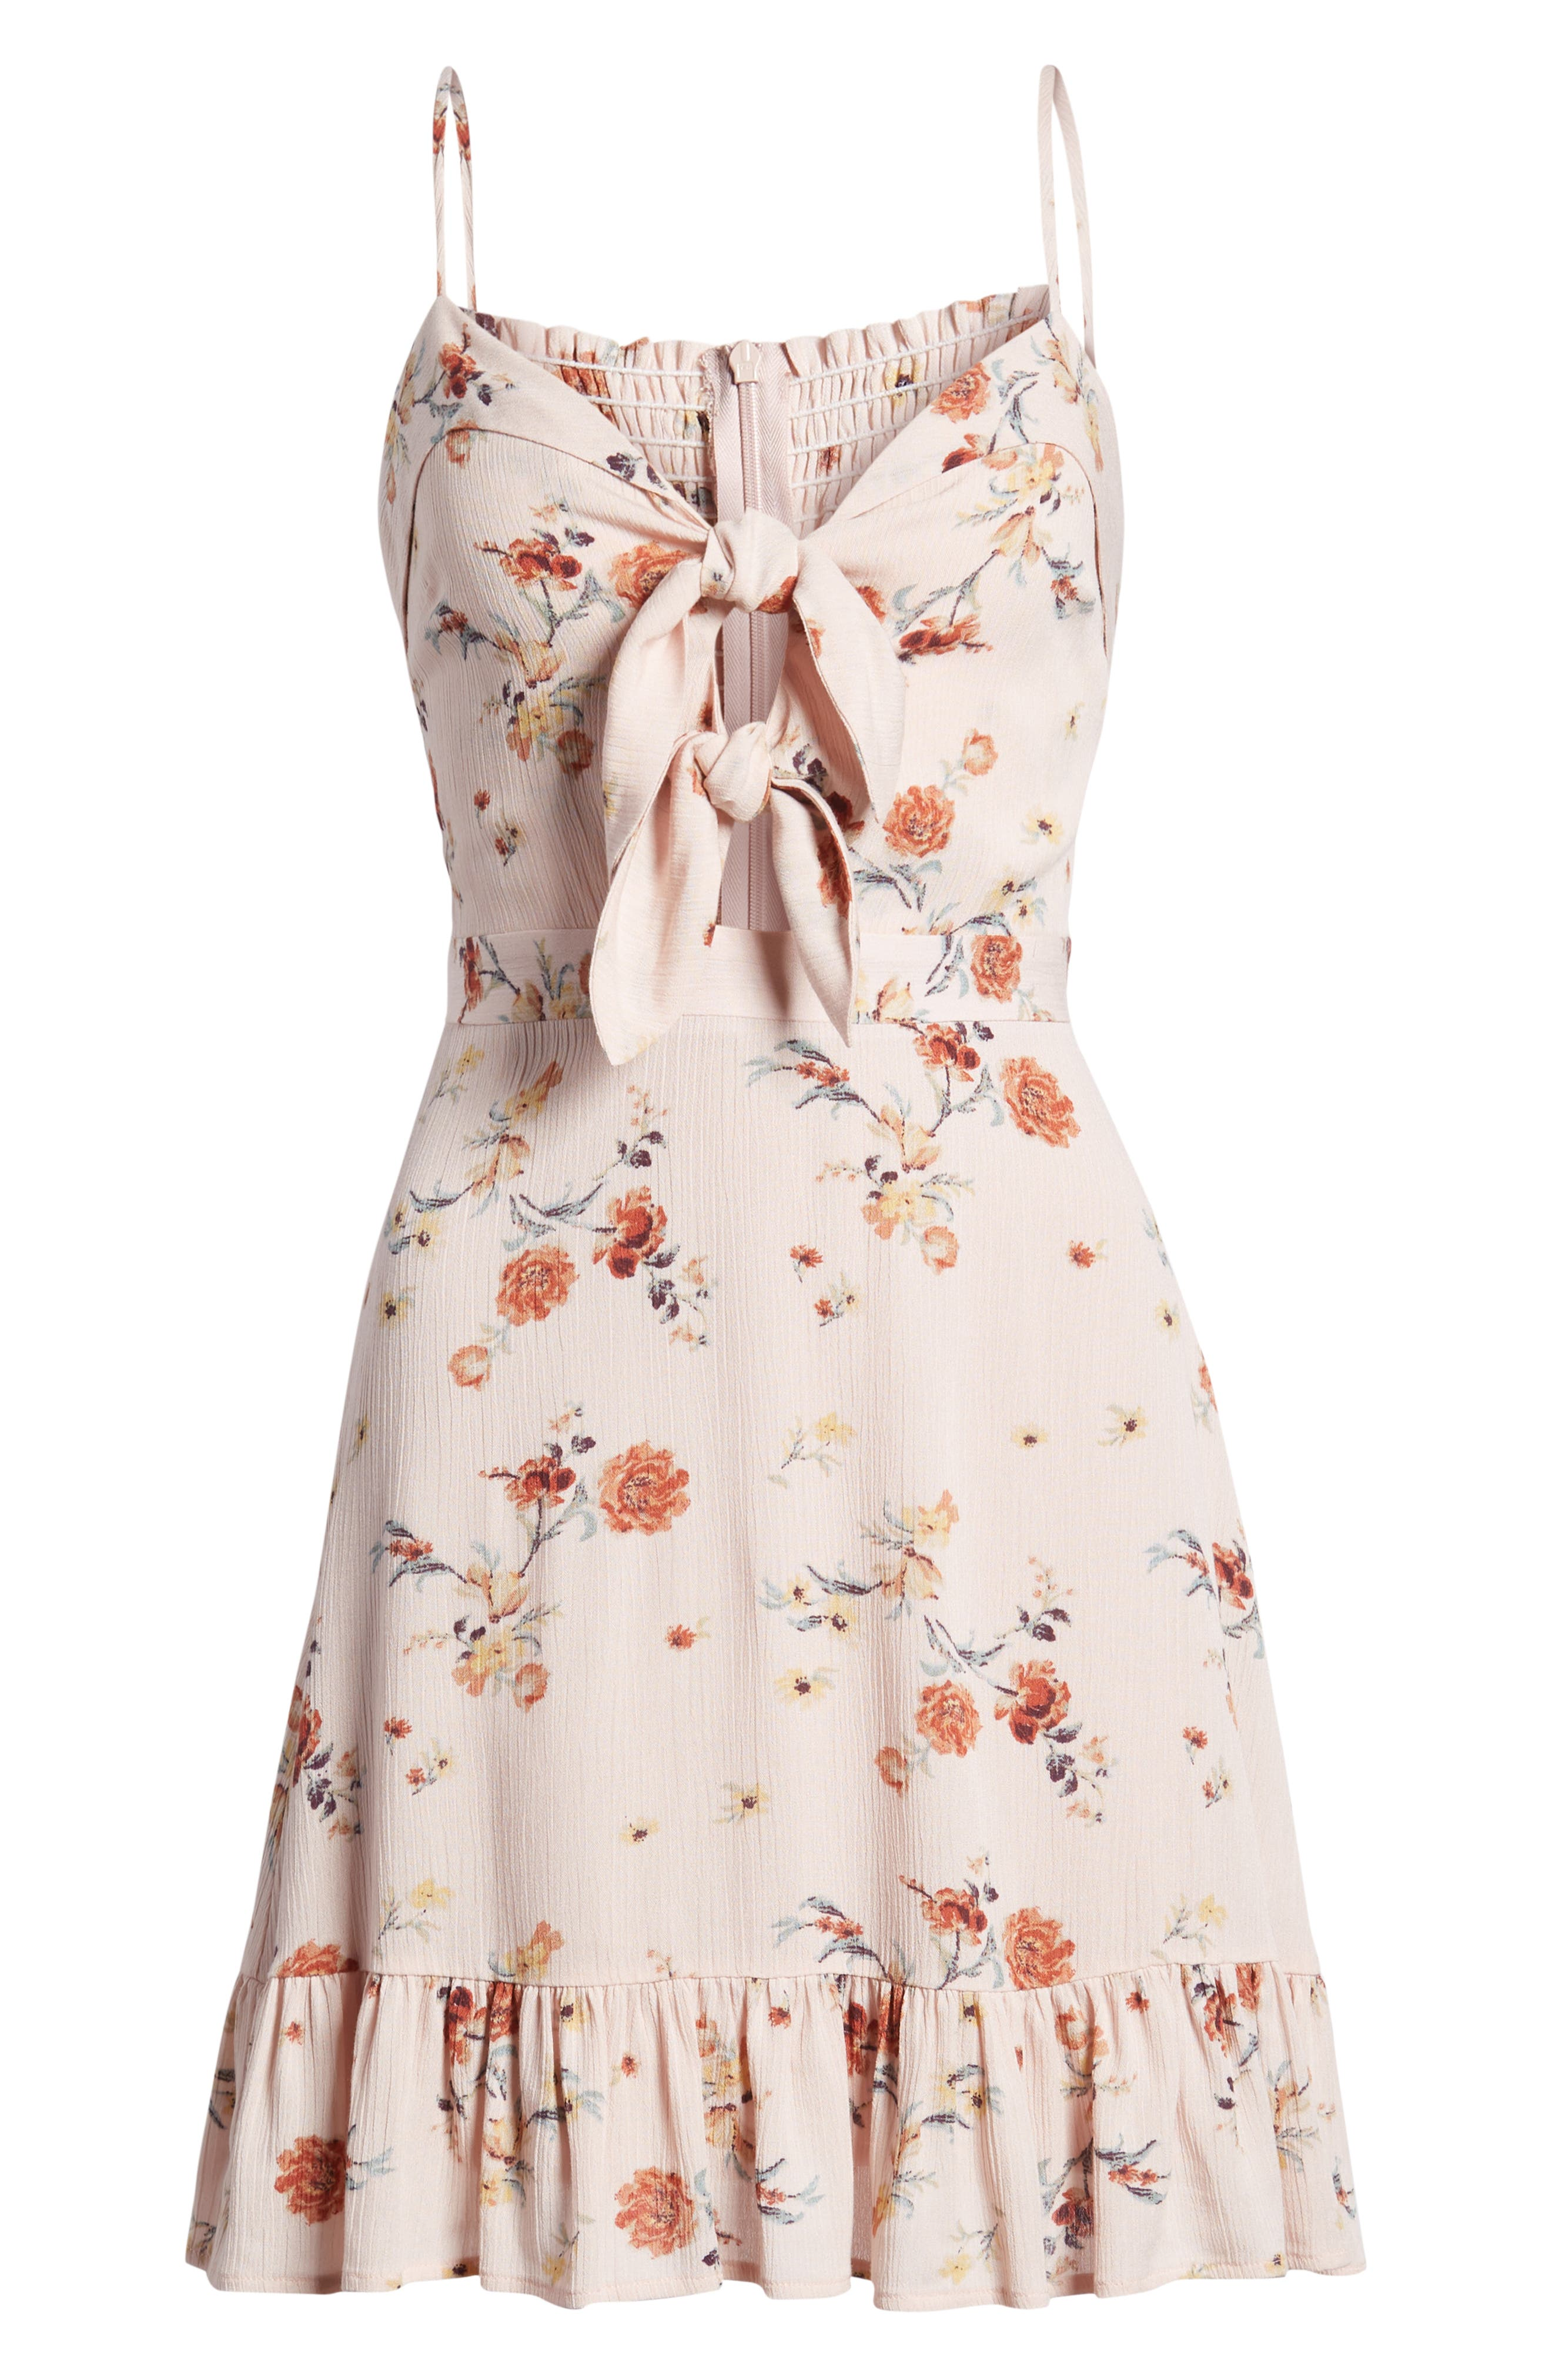 Rosa Floral Tie Front Minidress,                             Alternate thumbnail 8, color,                             Pink Floral